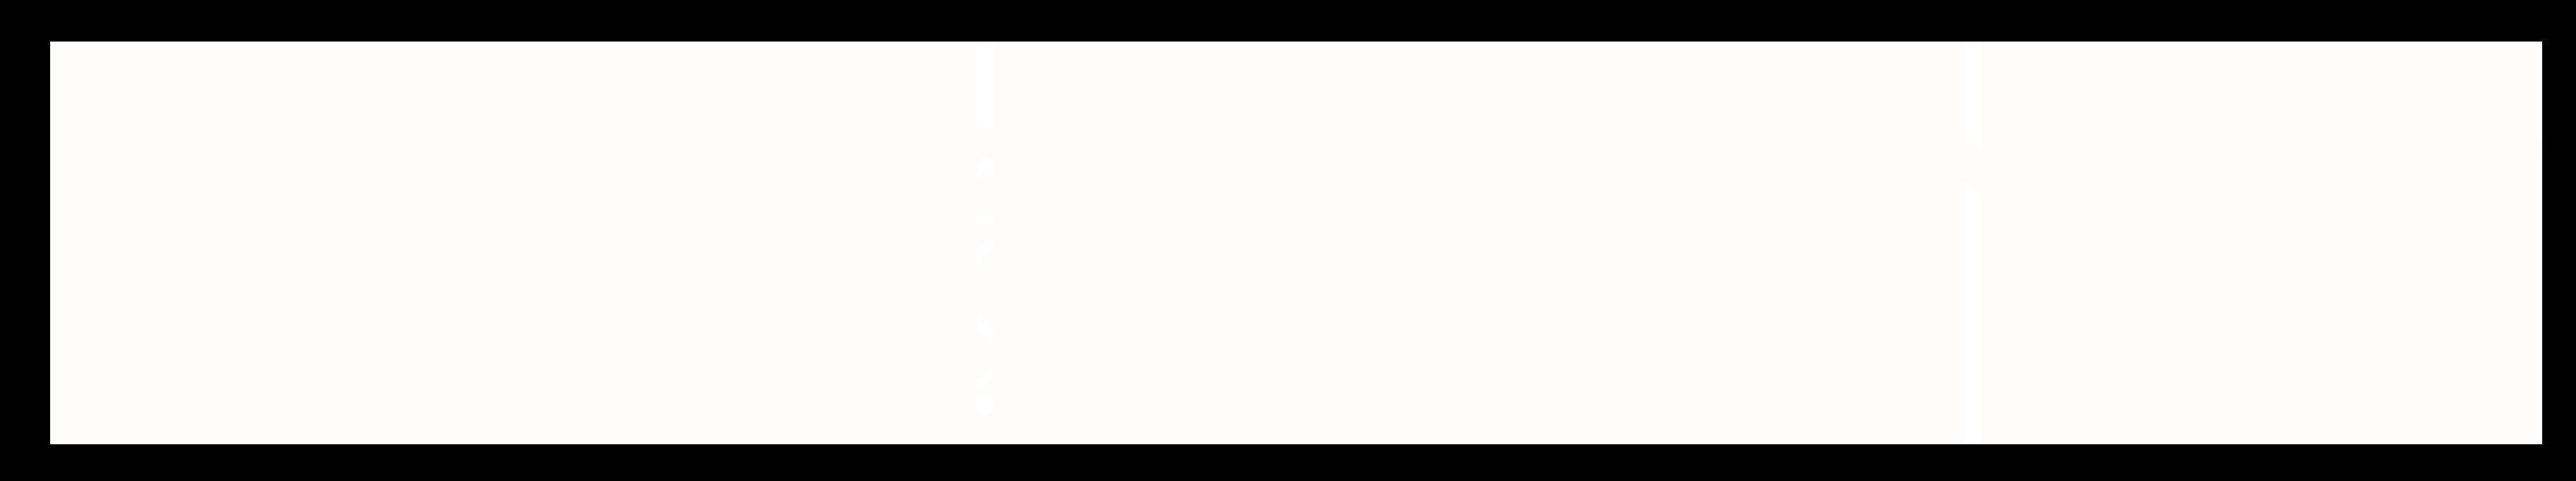 AdcommTV logo White